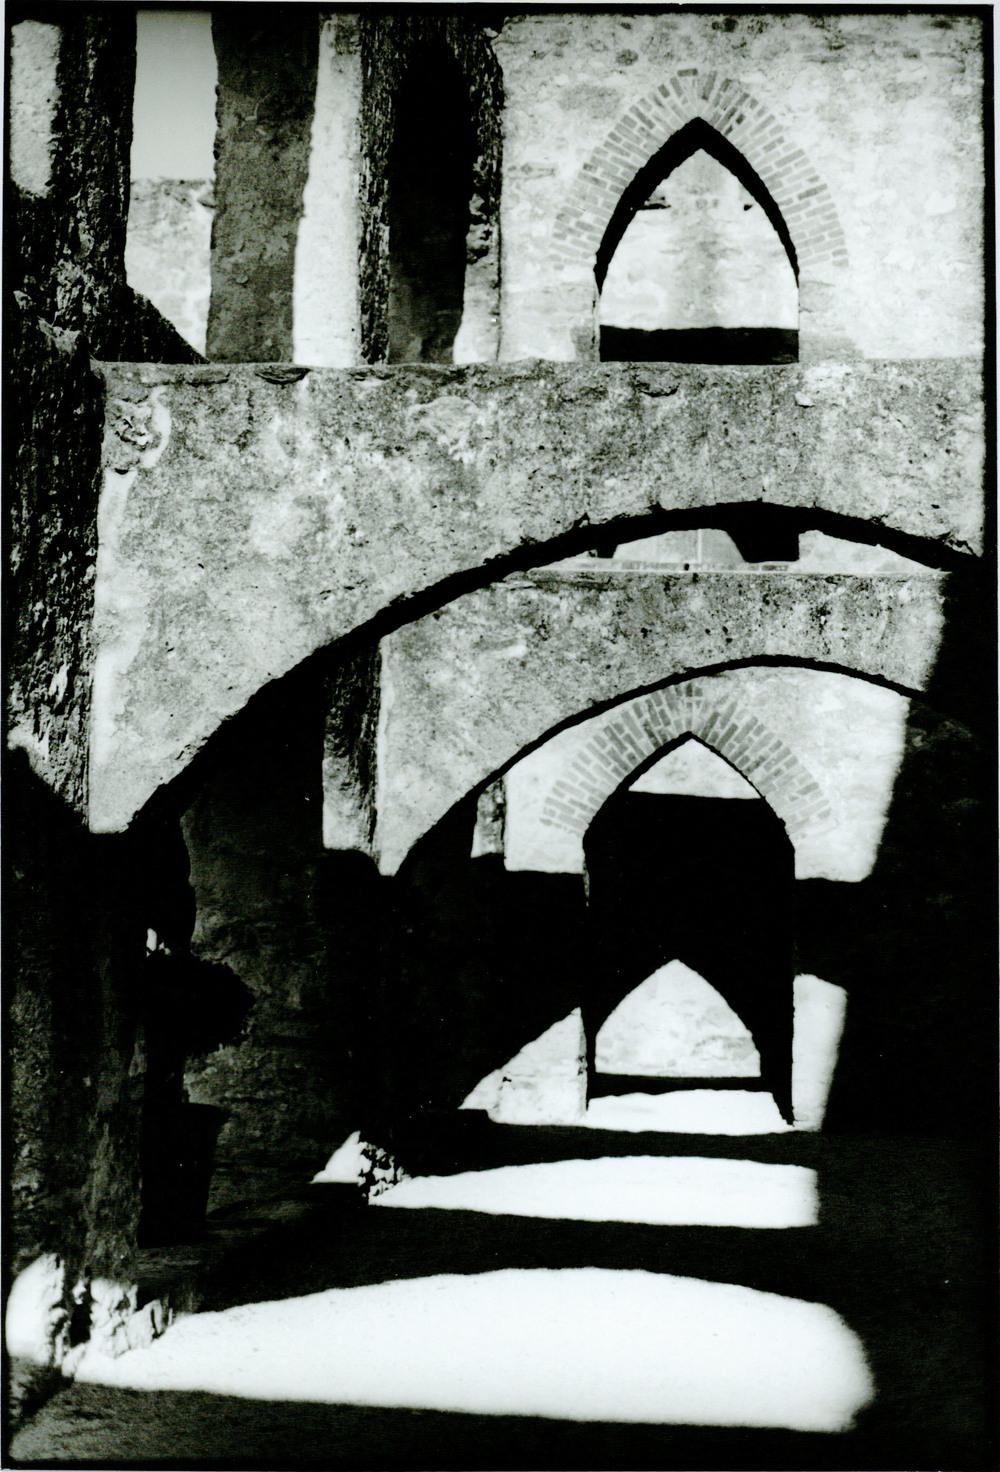 arches copy.jpg